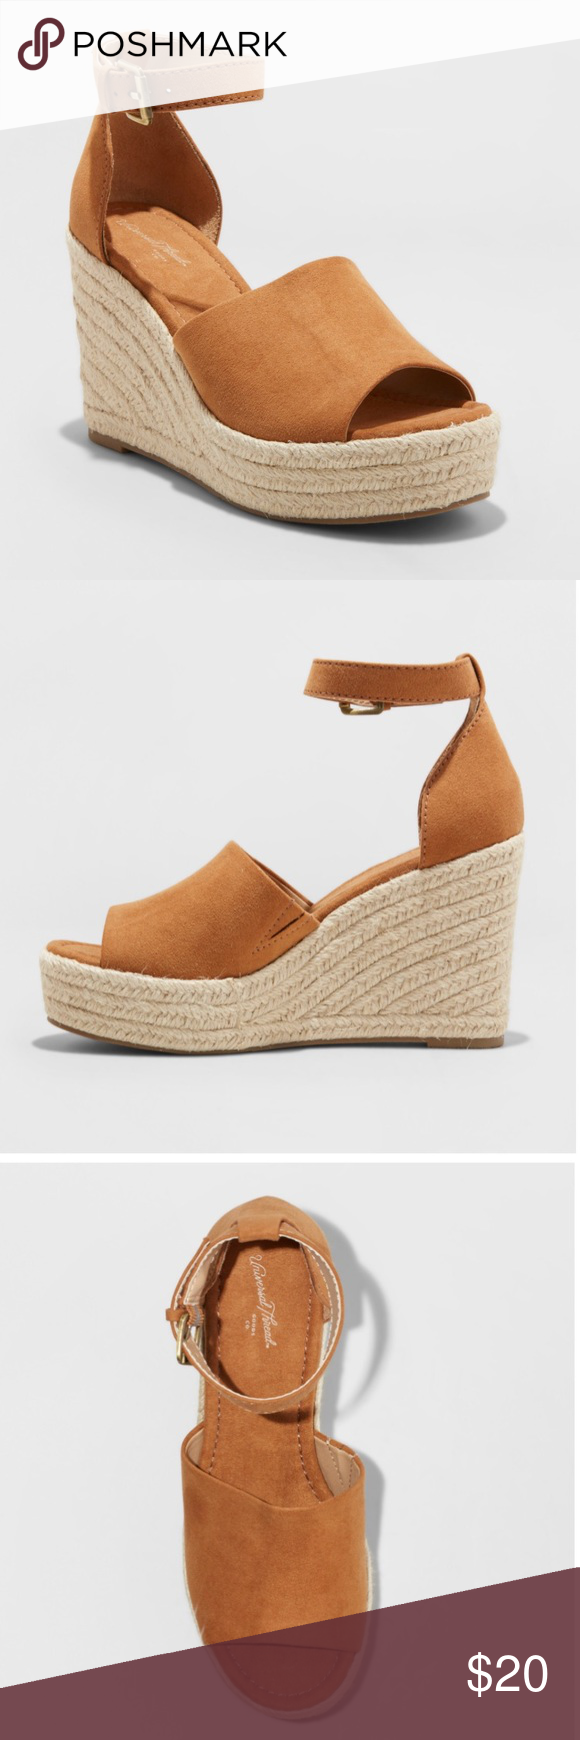 7f4b44dc47 Emery Espadrille Sandals- Universal Threads NWT Espadrille Wedge Sandals  Universal Thread Shoes Espadrilles